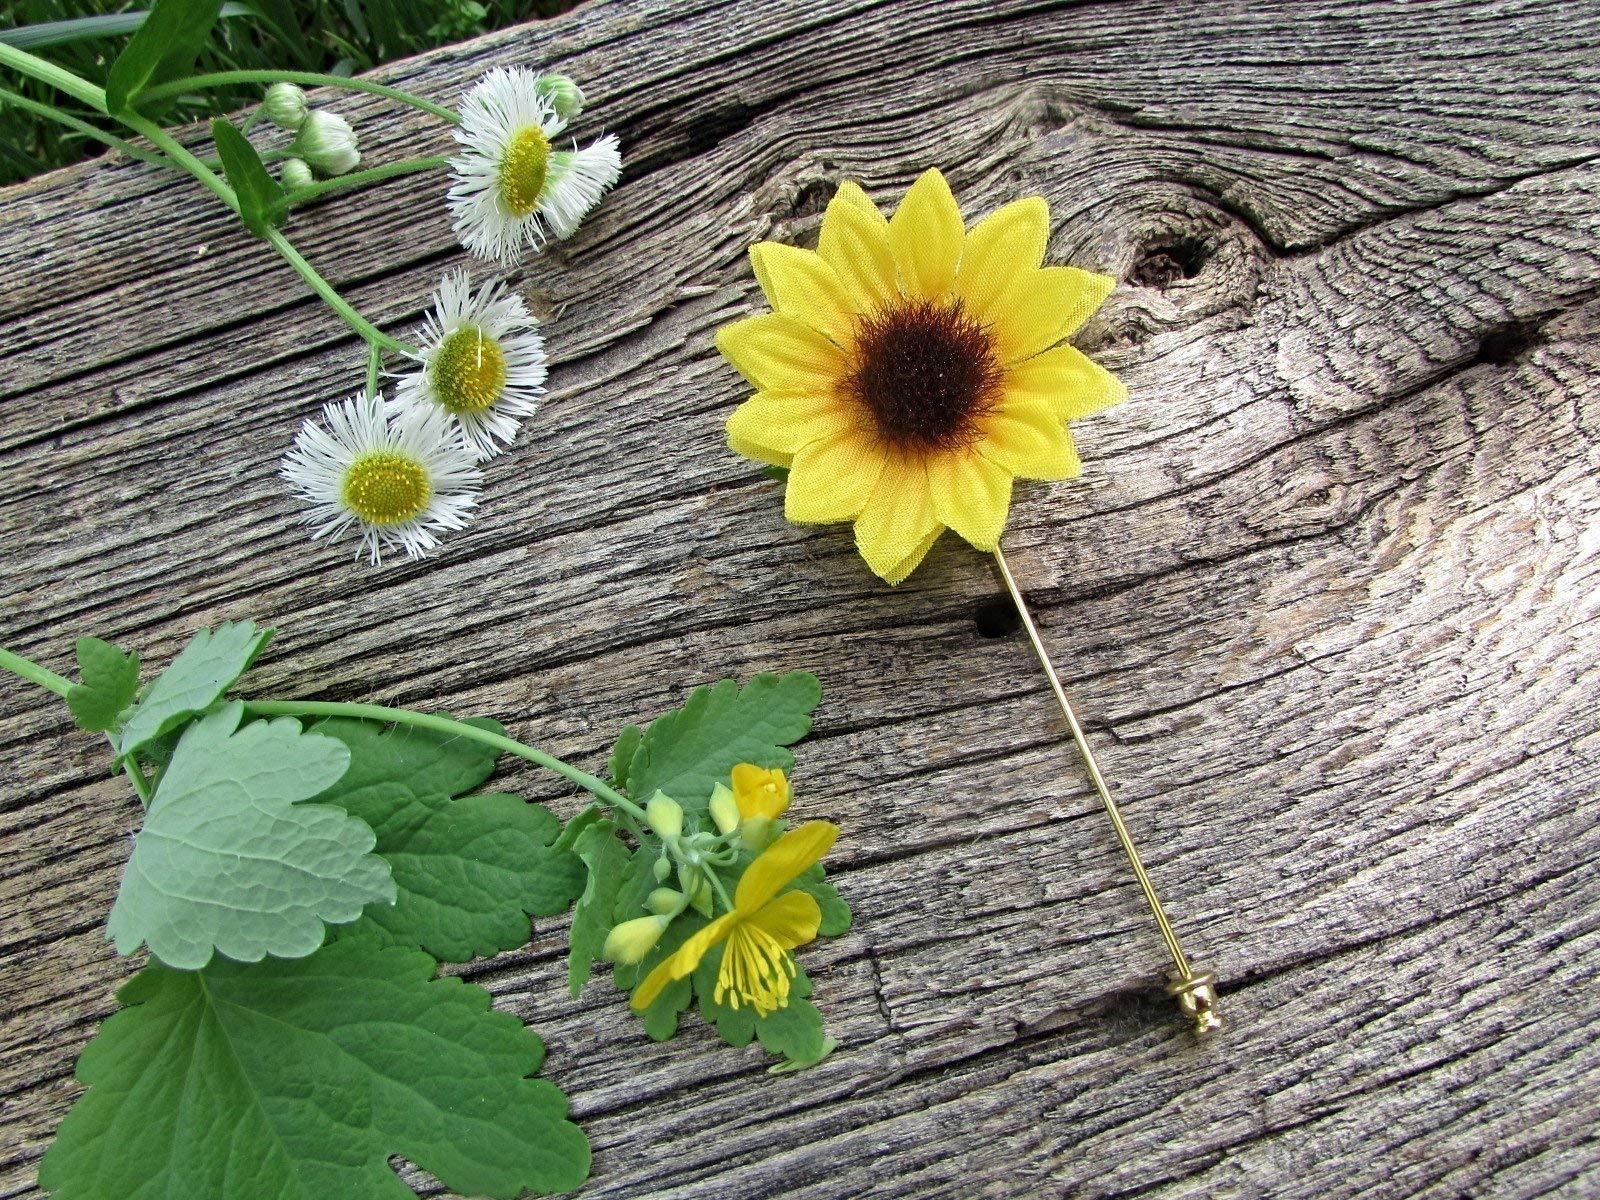 Sunflower Pin- Groom Groomsmen Mens Lapel Boutonniere- Bridesmaids Flower Girl Corsage- Boho Country Wedding Prom